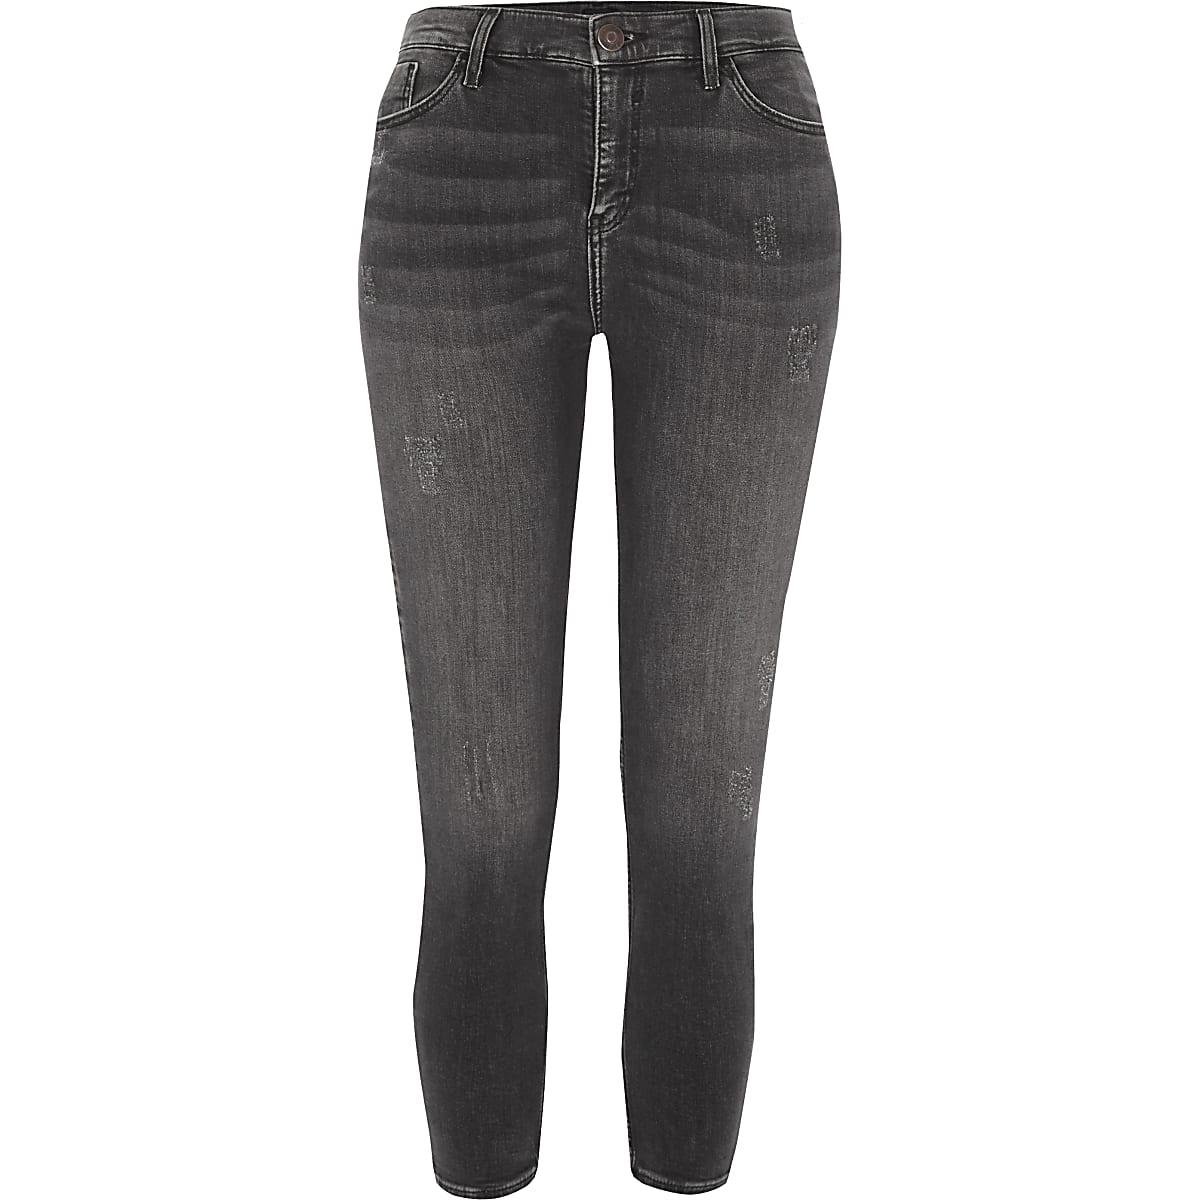 Petite grey Amelie distressed skinny jeans